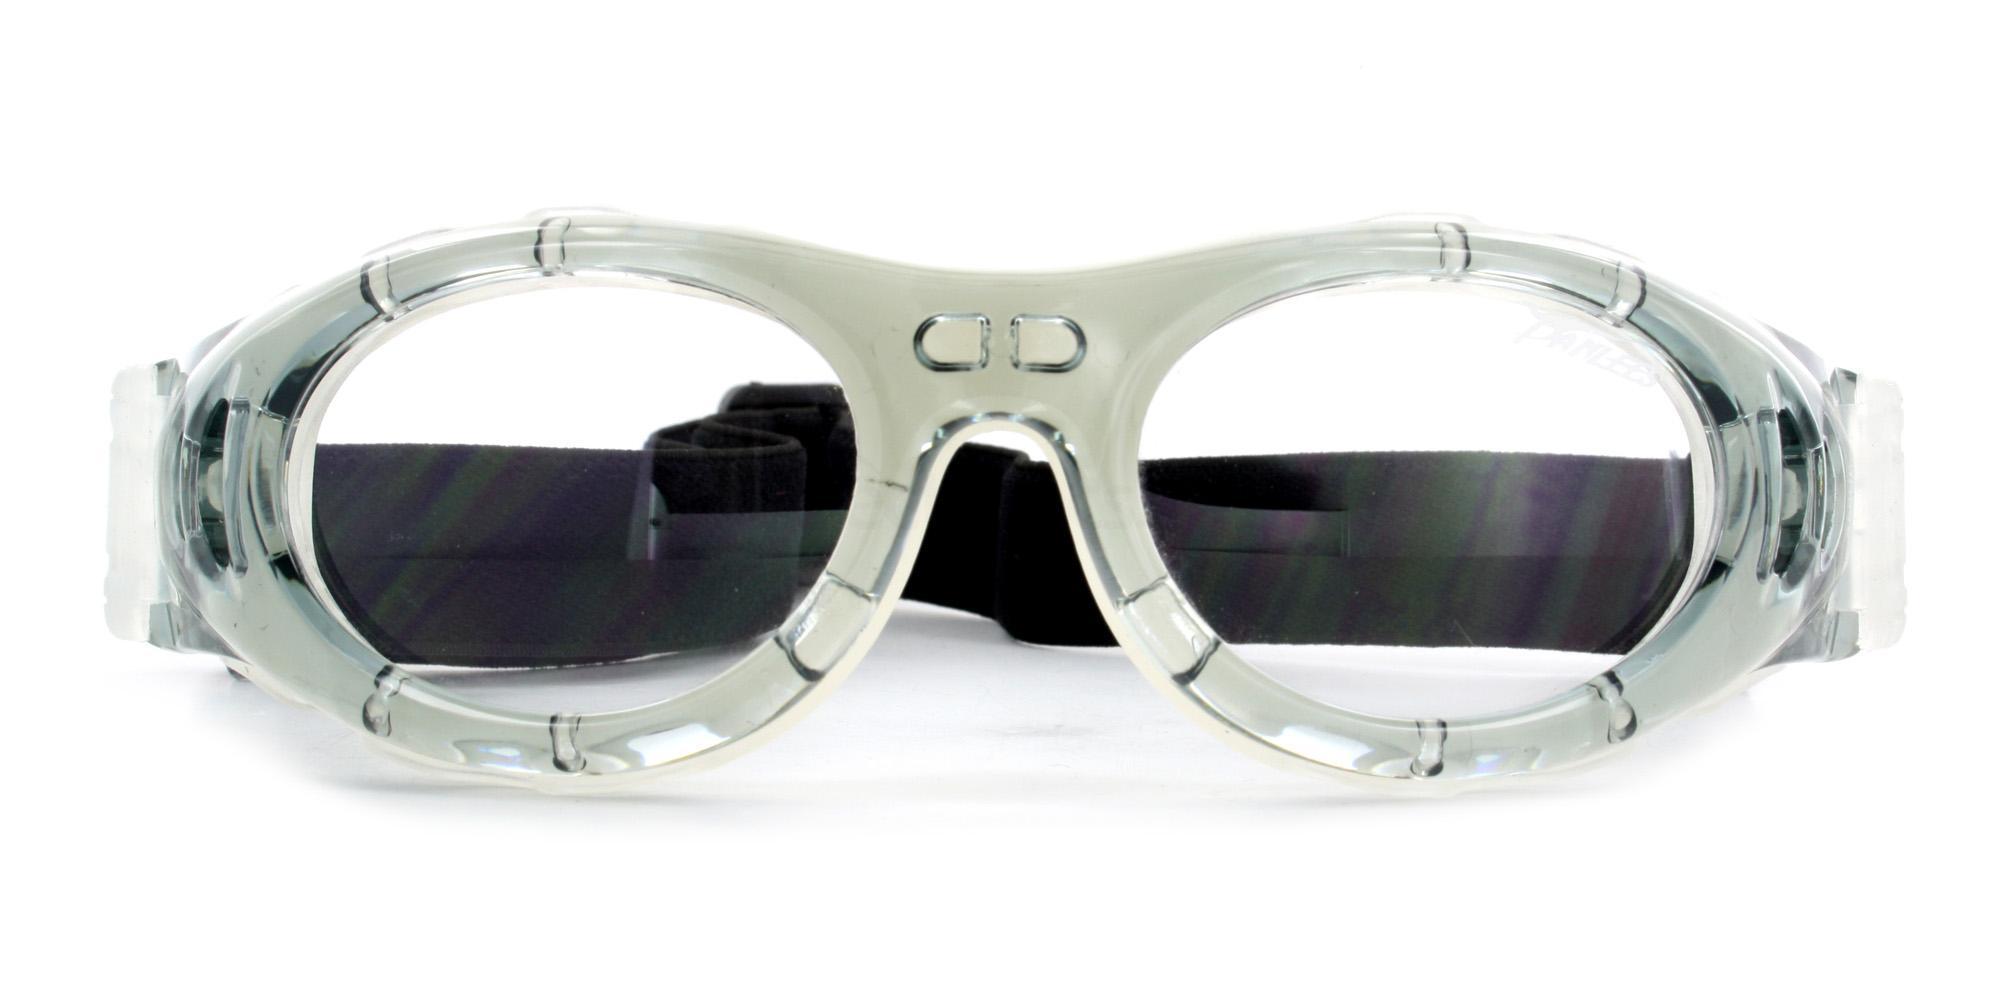 Clear Grey JH046 Sports Goggles, Aero